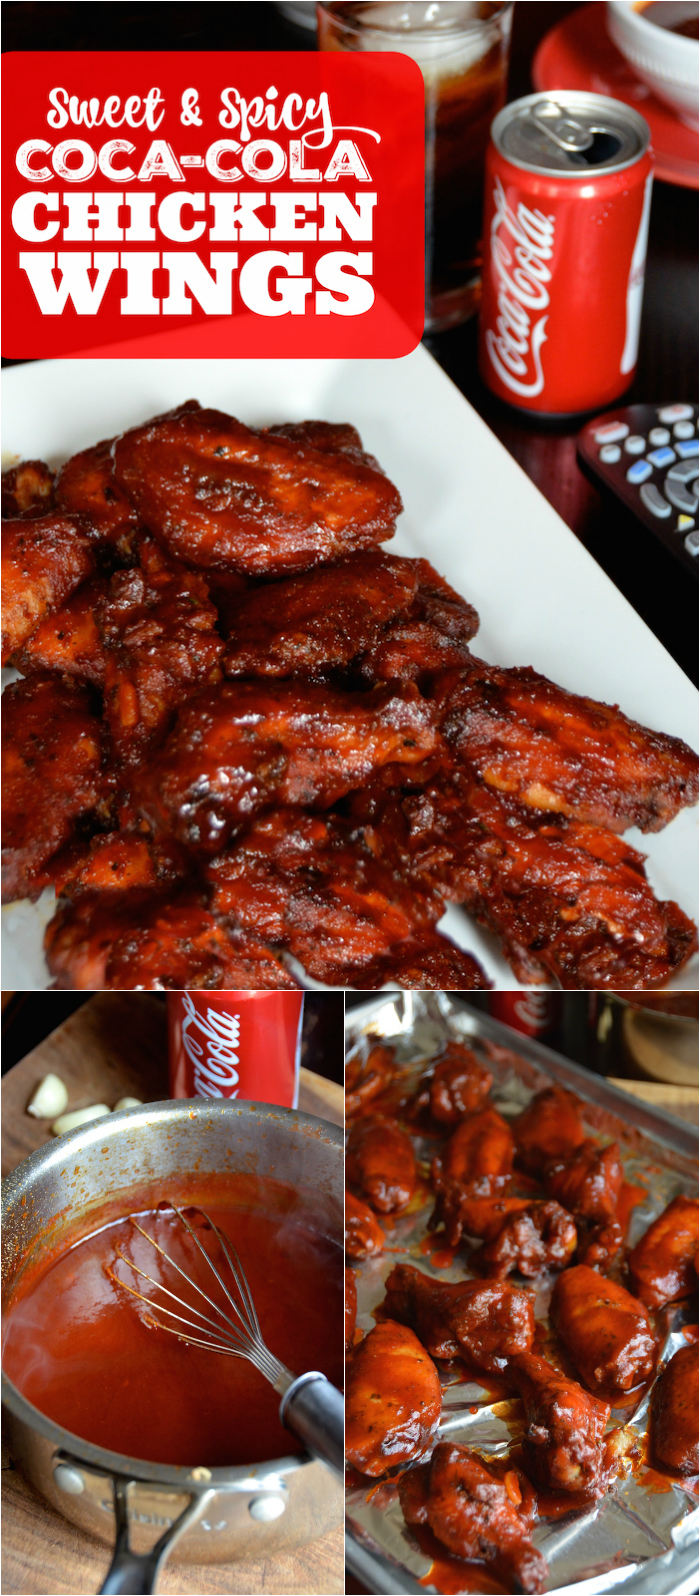 Sweet & Spicy Coca-Cola Chicken Wings - Always Order Dessert